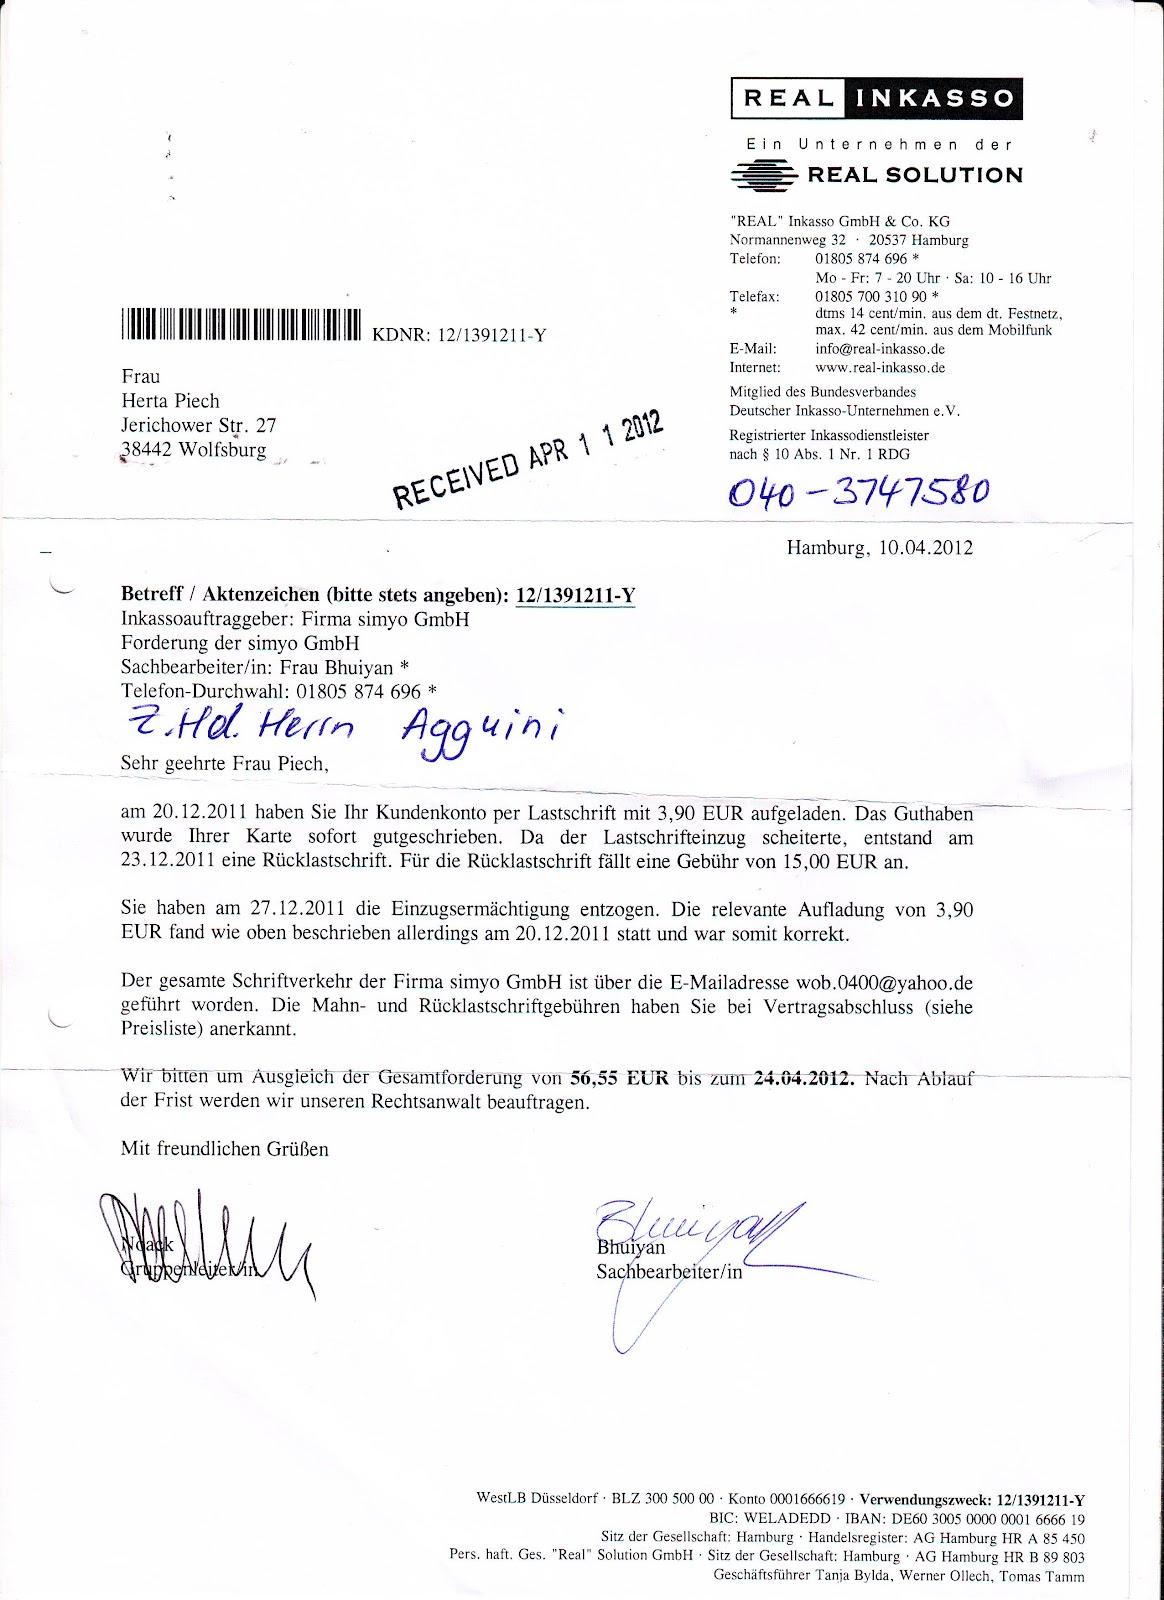 SIMYO-Widerruf-Lastschrift-Illegale-Abbuchung-Inkasso